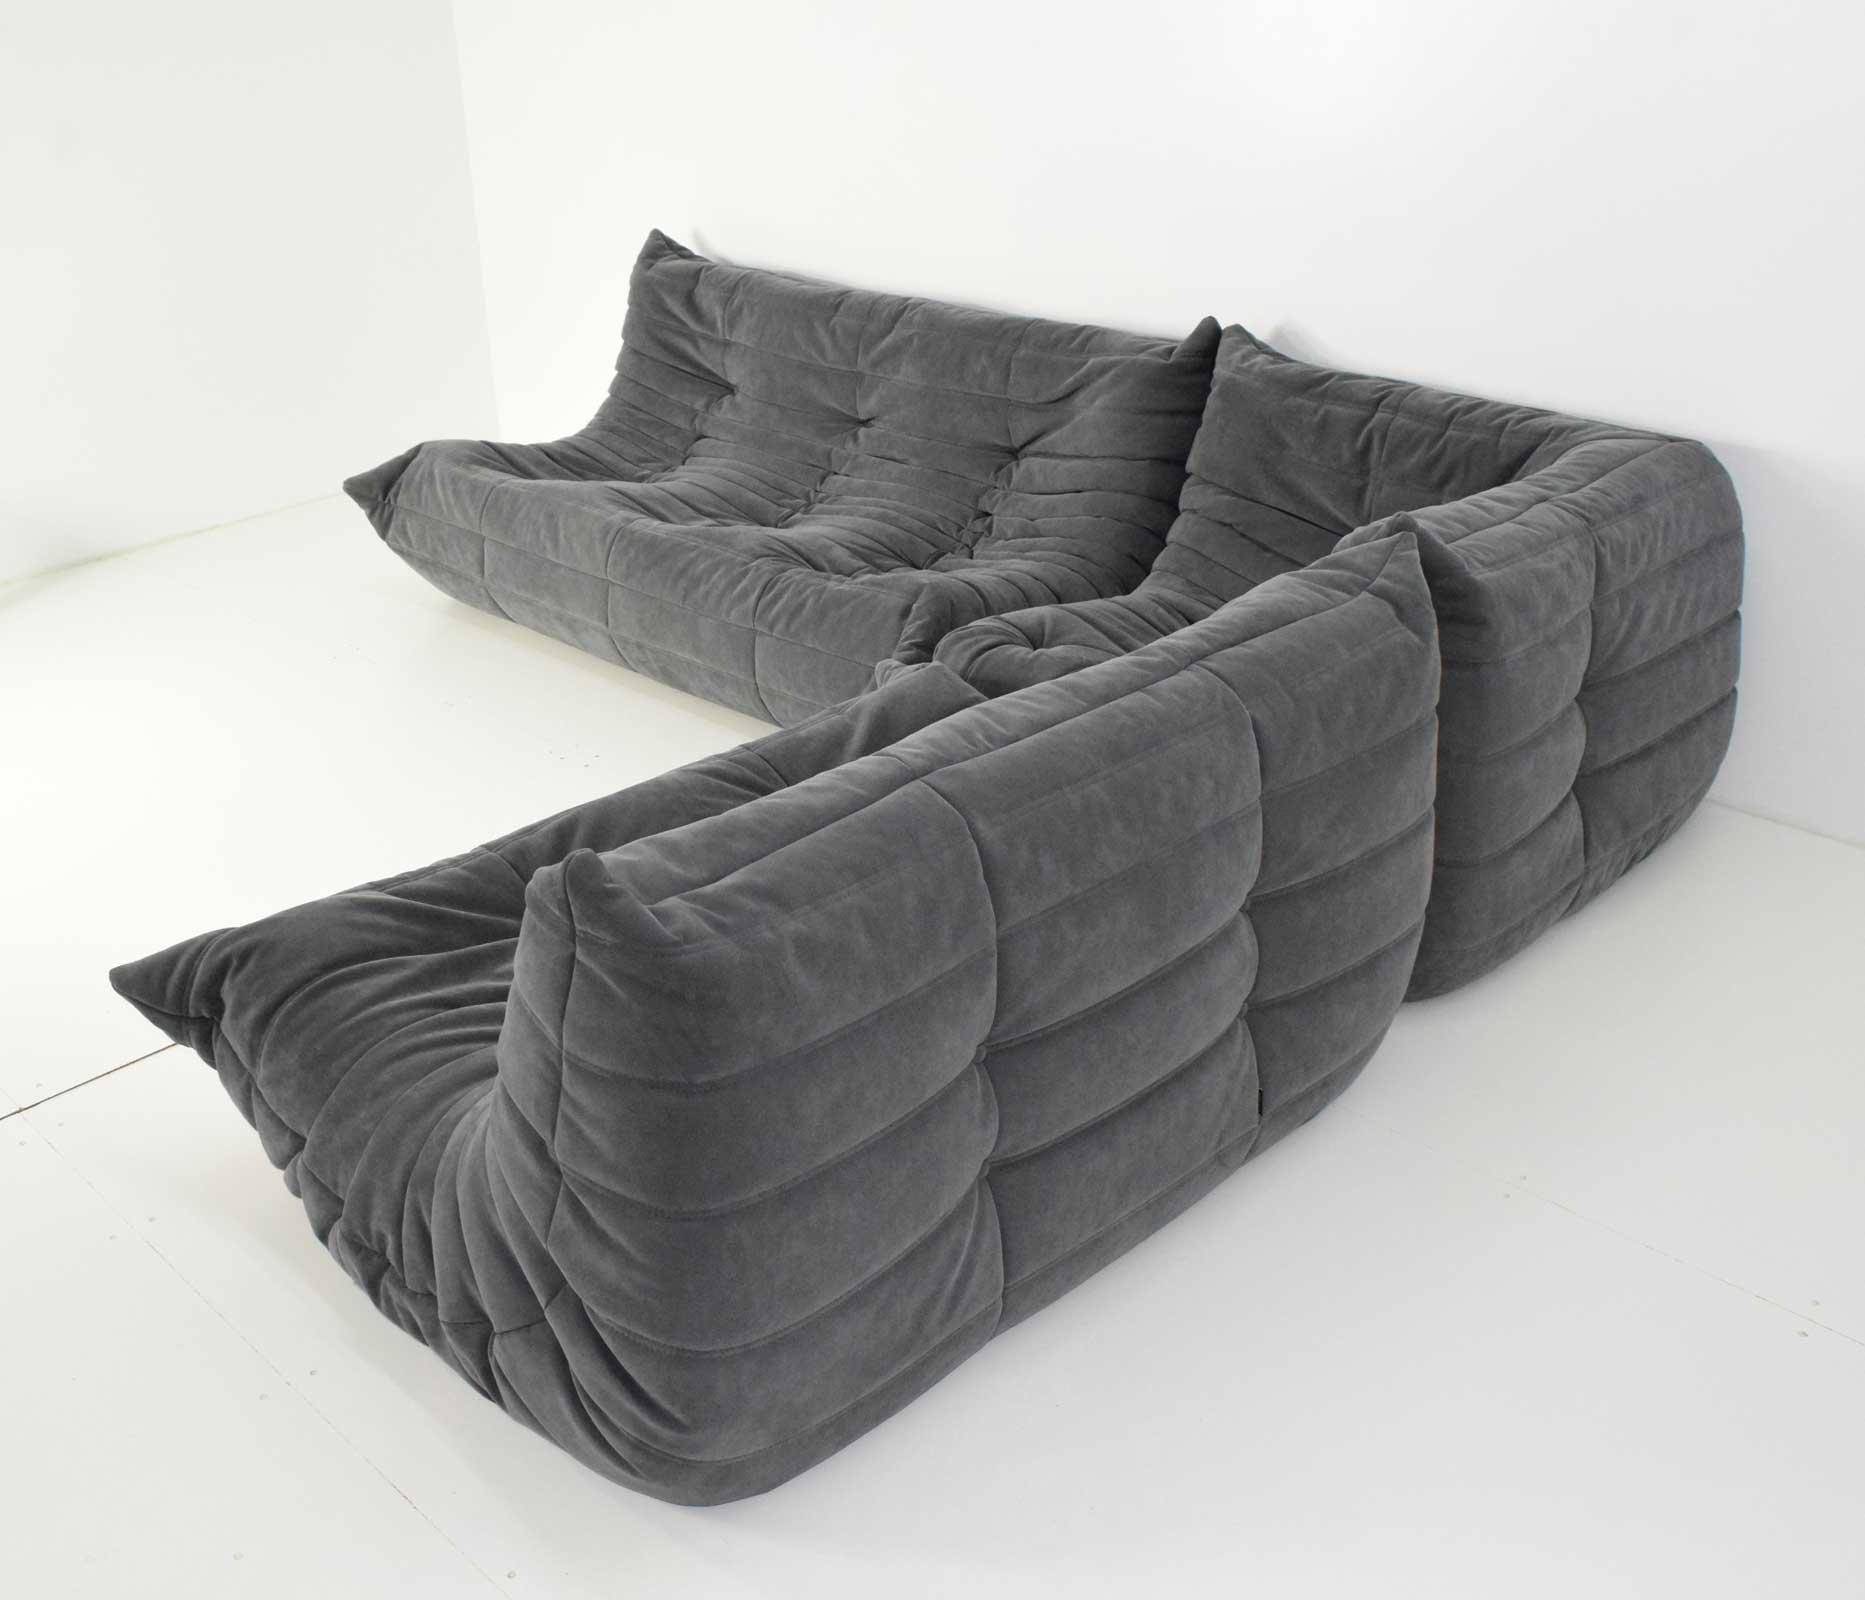 superb ligne roset togo sofa in grey suede by michel ducaroy decaso rh decaso com ligne roset togo sofa for sale ligne roset togo sofa for sale